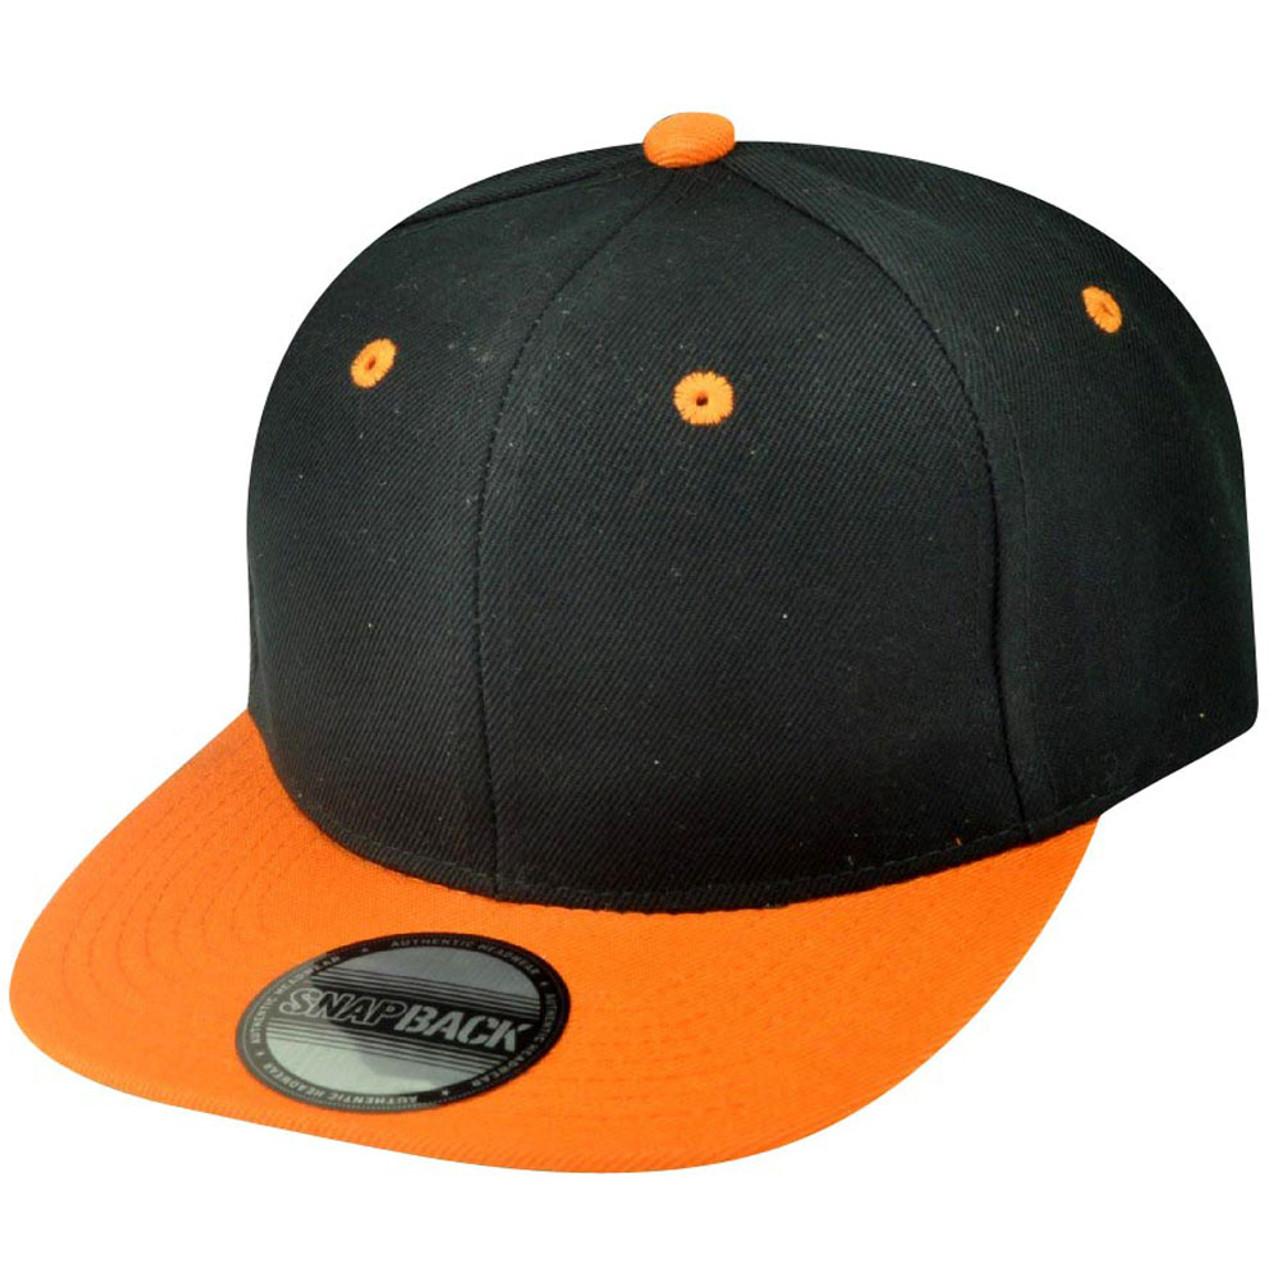 300fb4f2 Blank Plain Two Tone Black Orange Adjustable Snapback Flat Bill Acrylic Hat  Cap - Cap Store Online.com